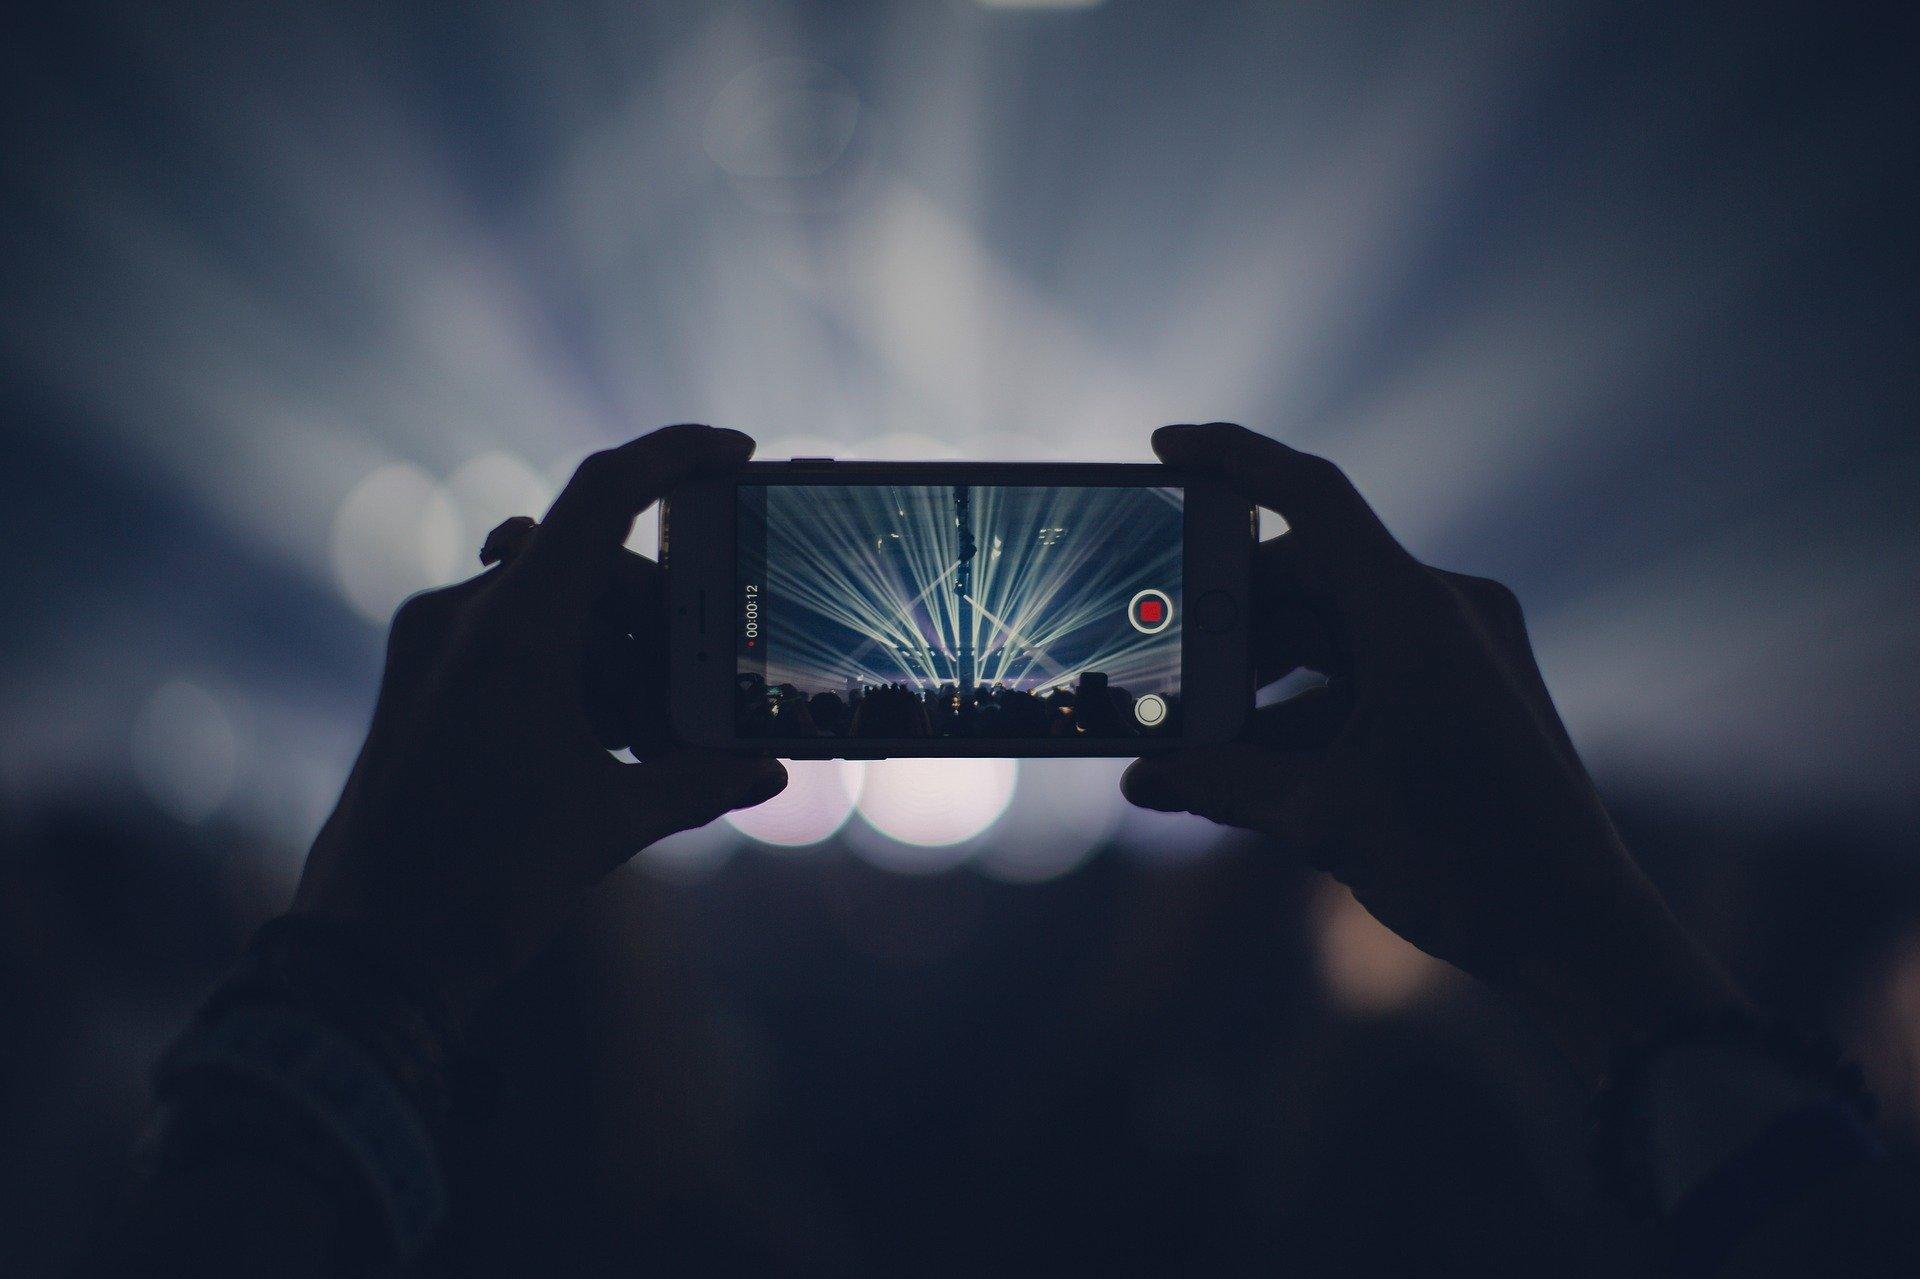 iPhone recording video